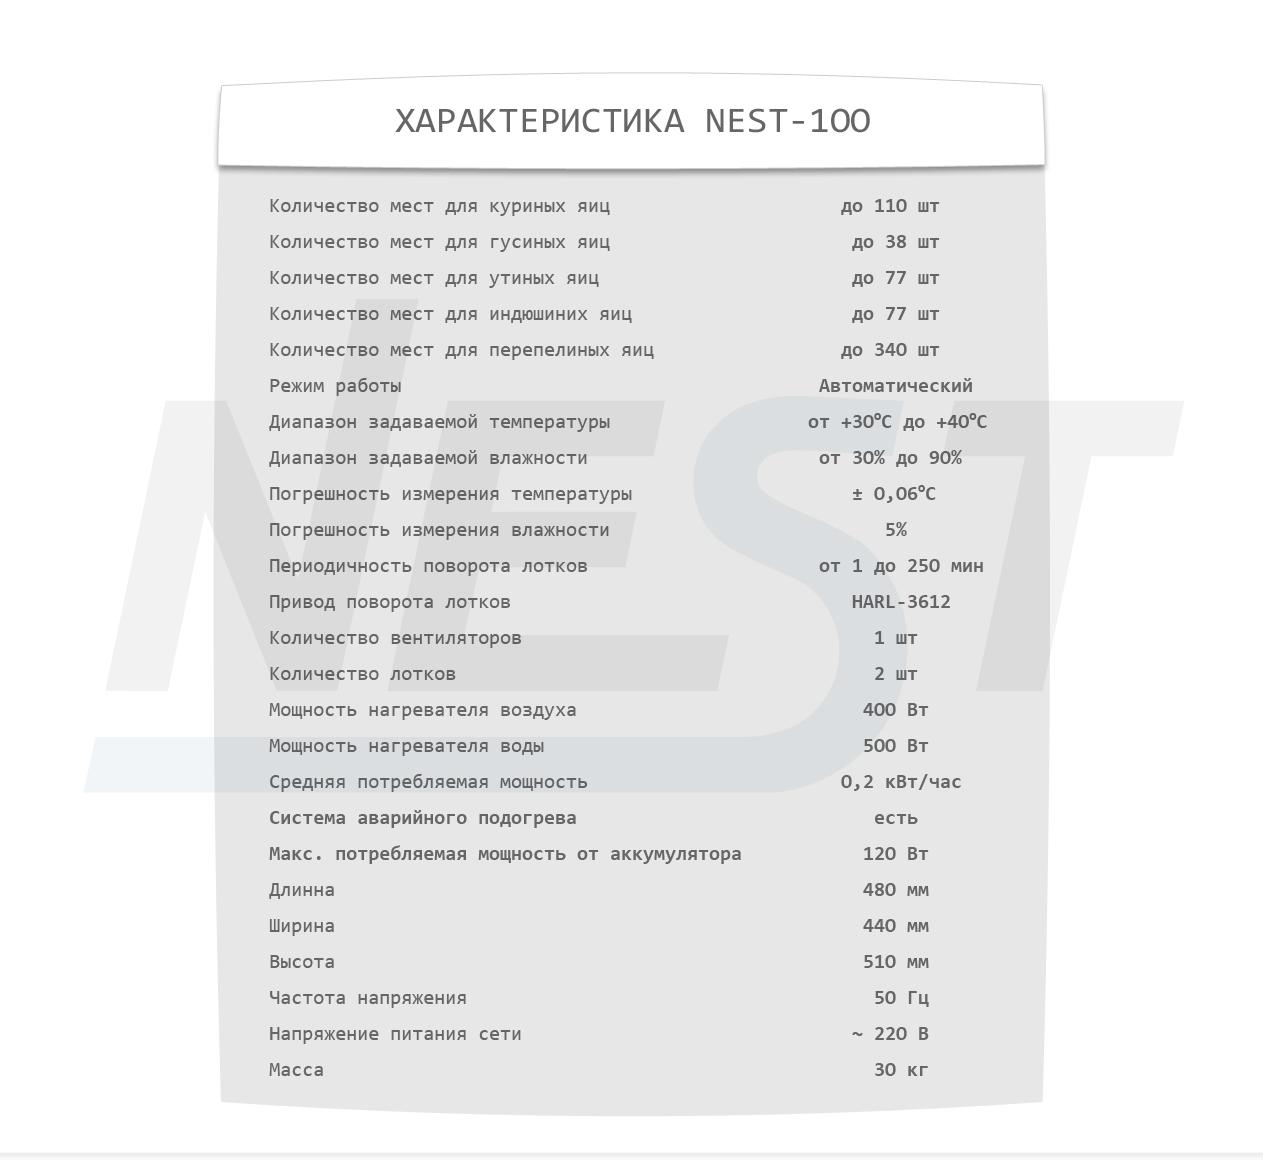 http://купи-инкубатор.рф/images/upload/harakt100.jpg